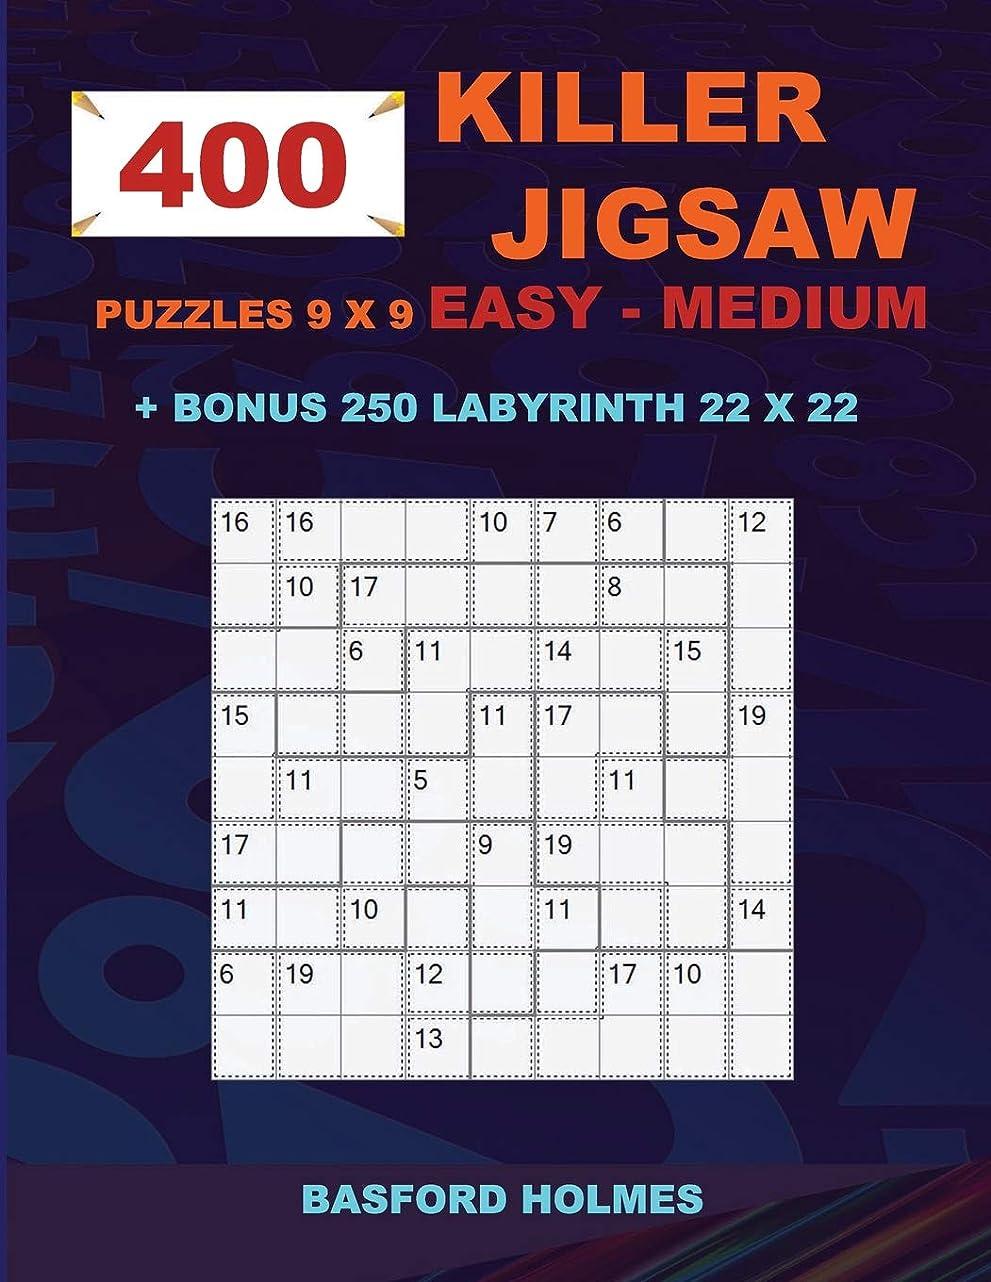 400 KILLER JIGSAW puzzles 9 x 9 EASY - MEDIUM + BONUS 250 LABYRINTH 22 x 22: Sudoku Easy - Medium level and Maze puzzle very hard levels (KILLER Jigsaw classic sudoku)